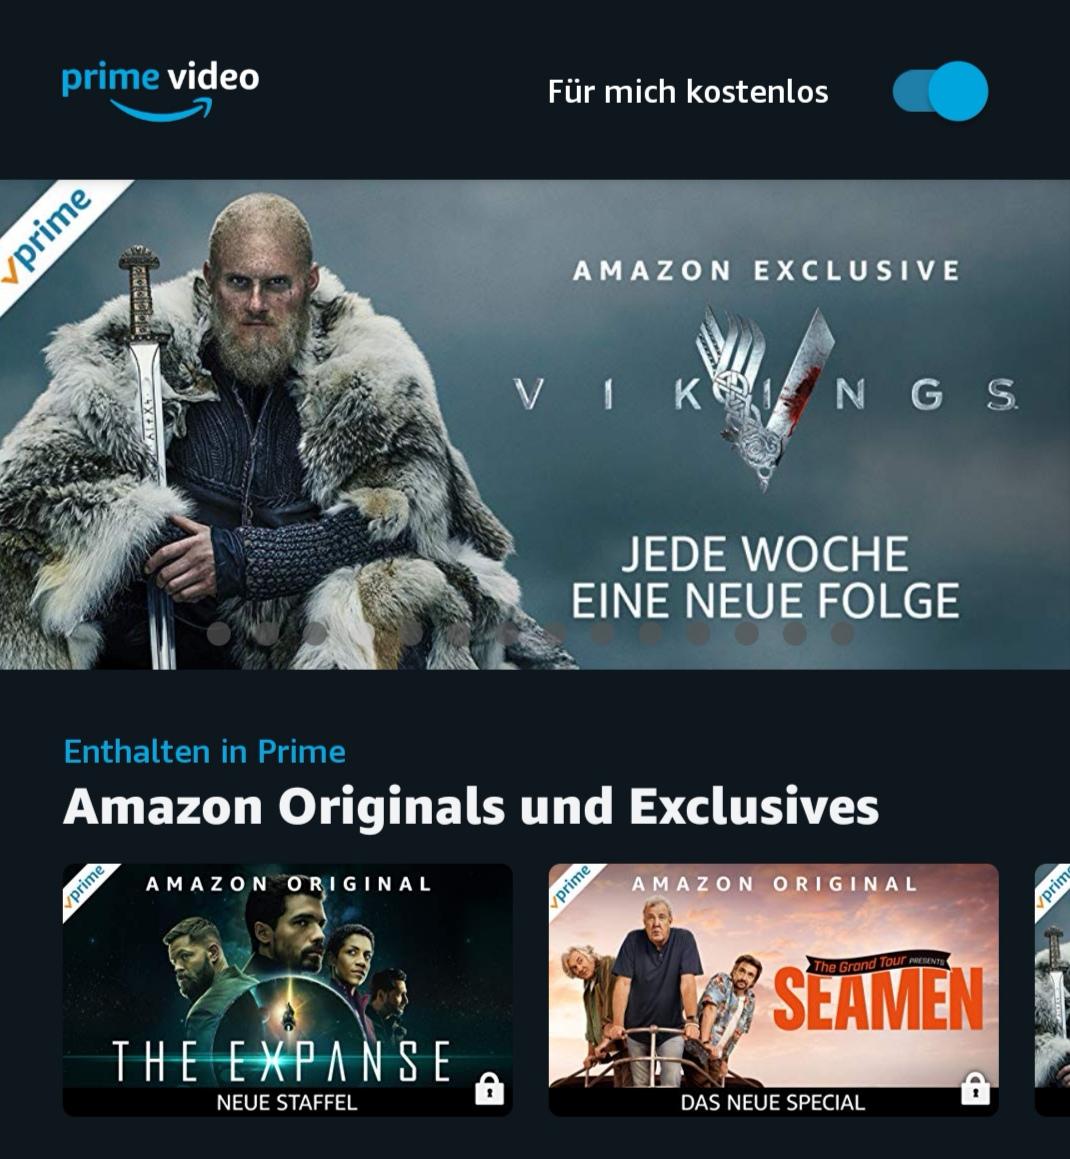 Streaming - Netflix beliebter als Amazon Prime